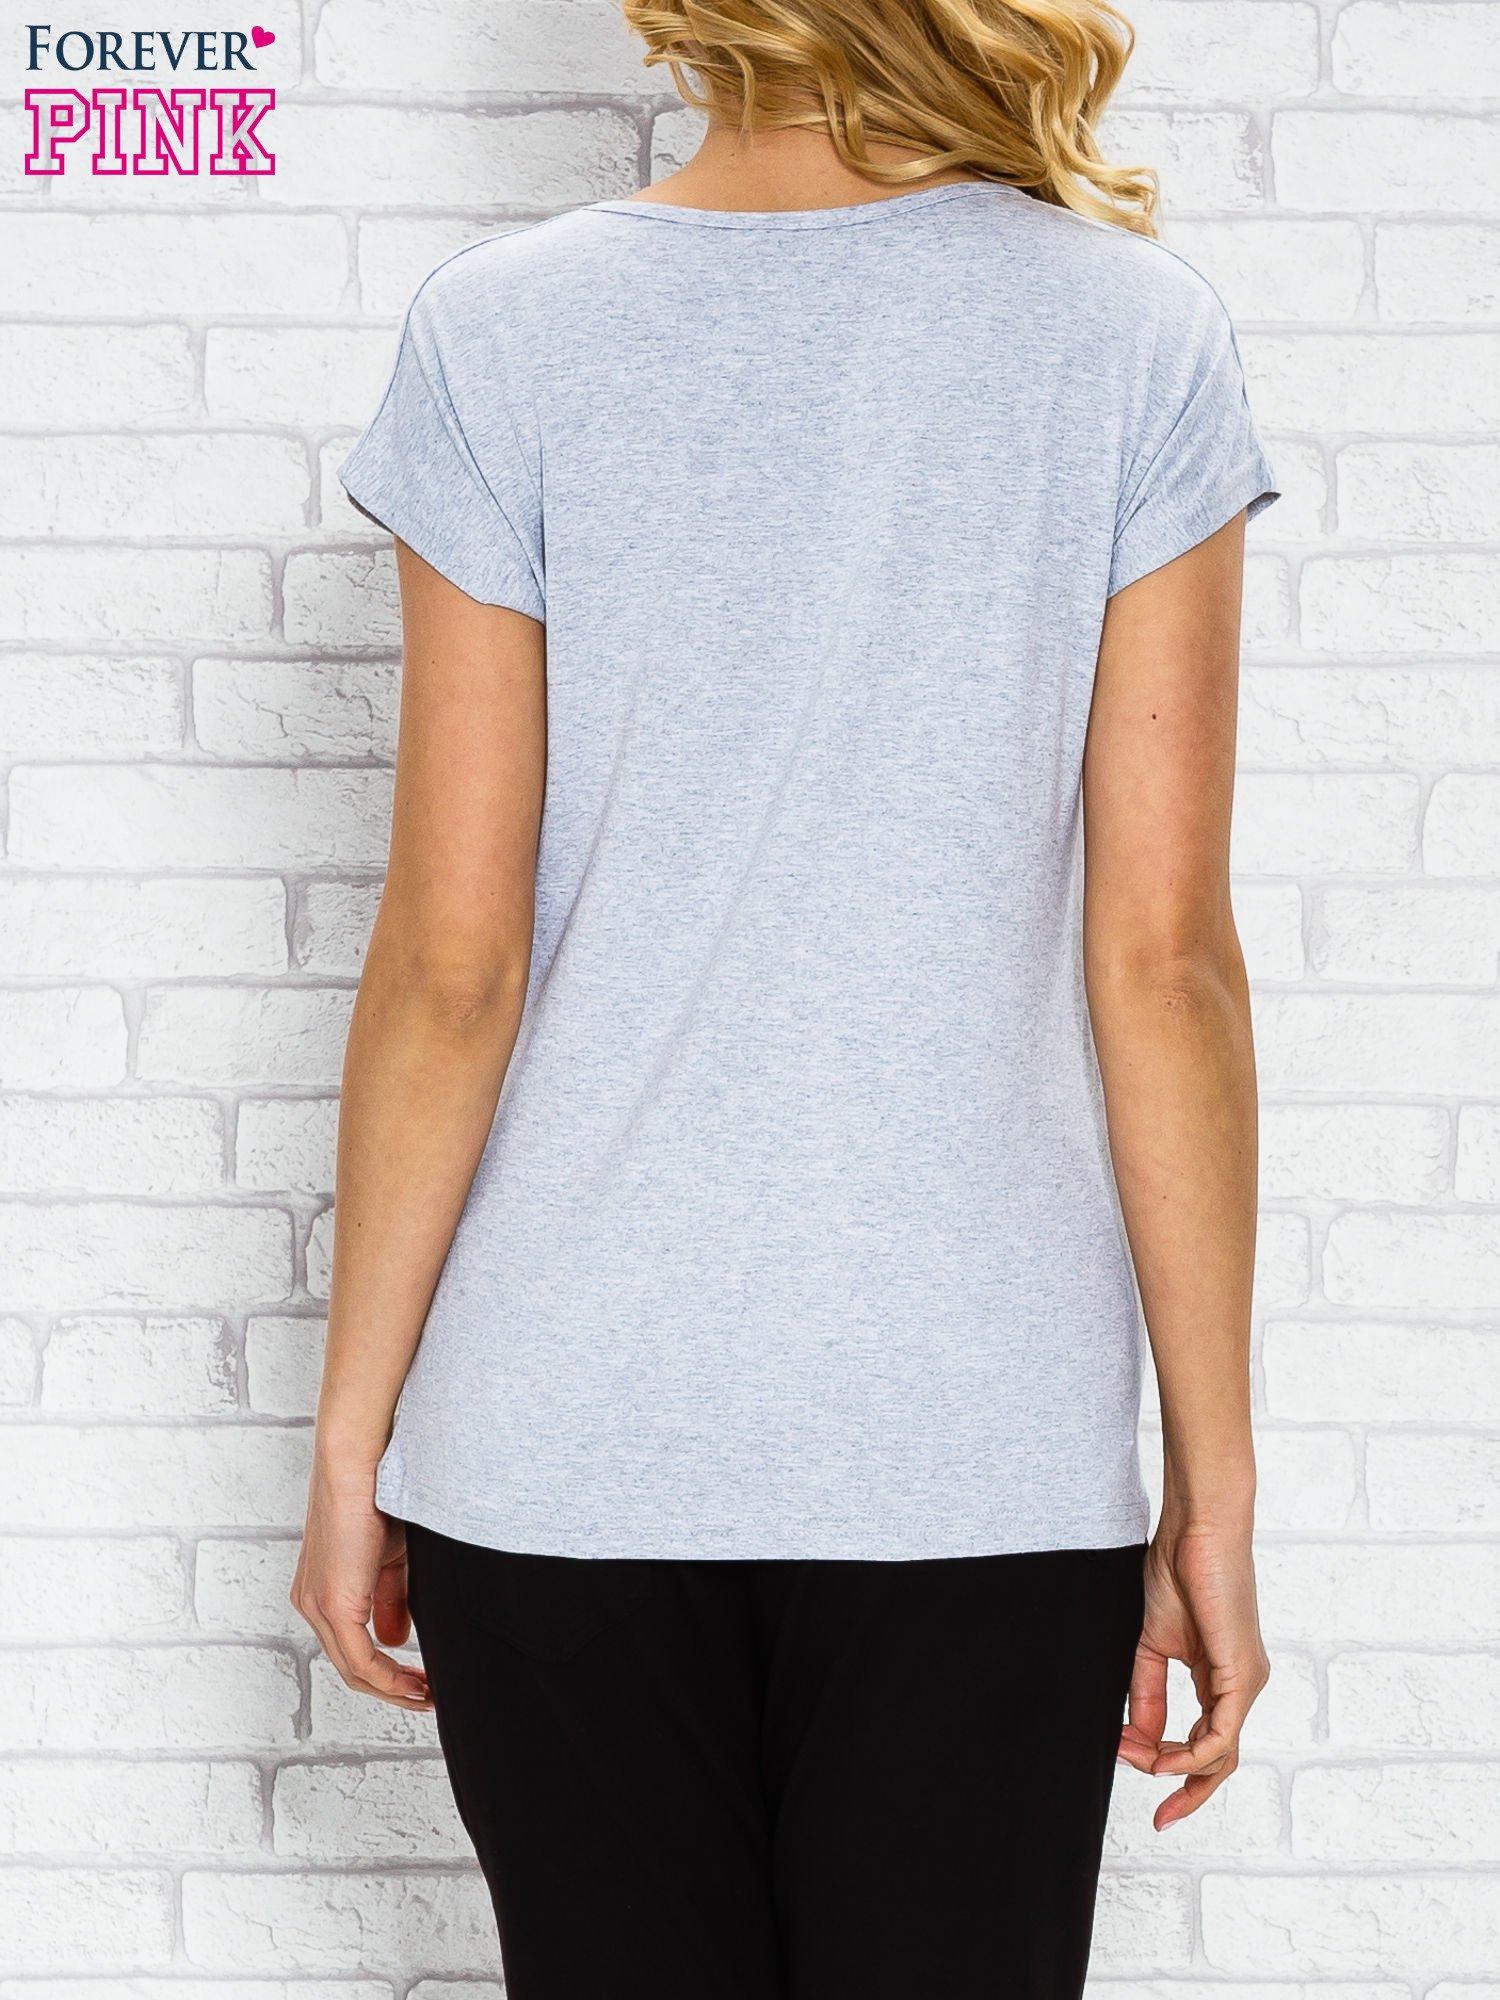 Szary t-shirt z napisem TOO VOGUE FOR YOU z dżetami                                  zdj.                                  2